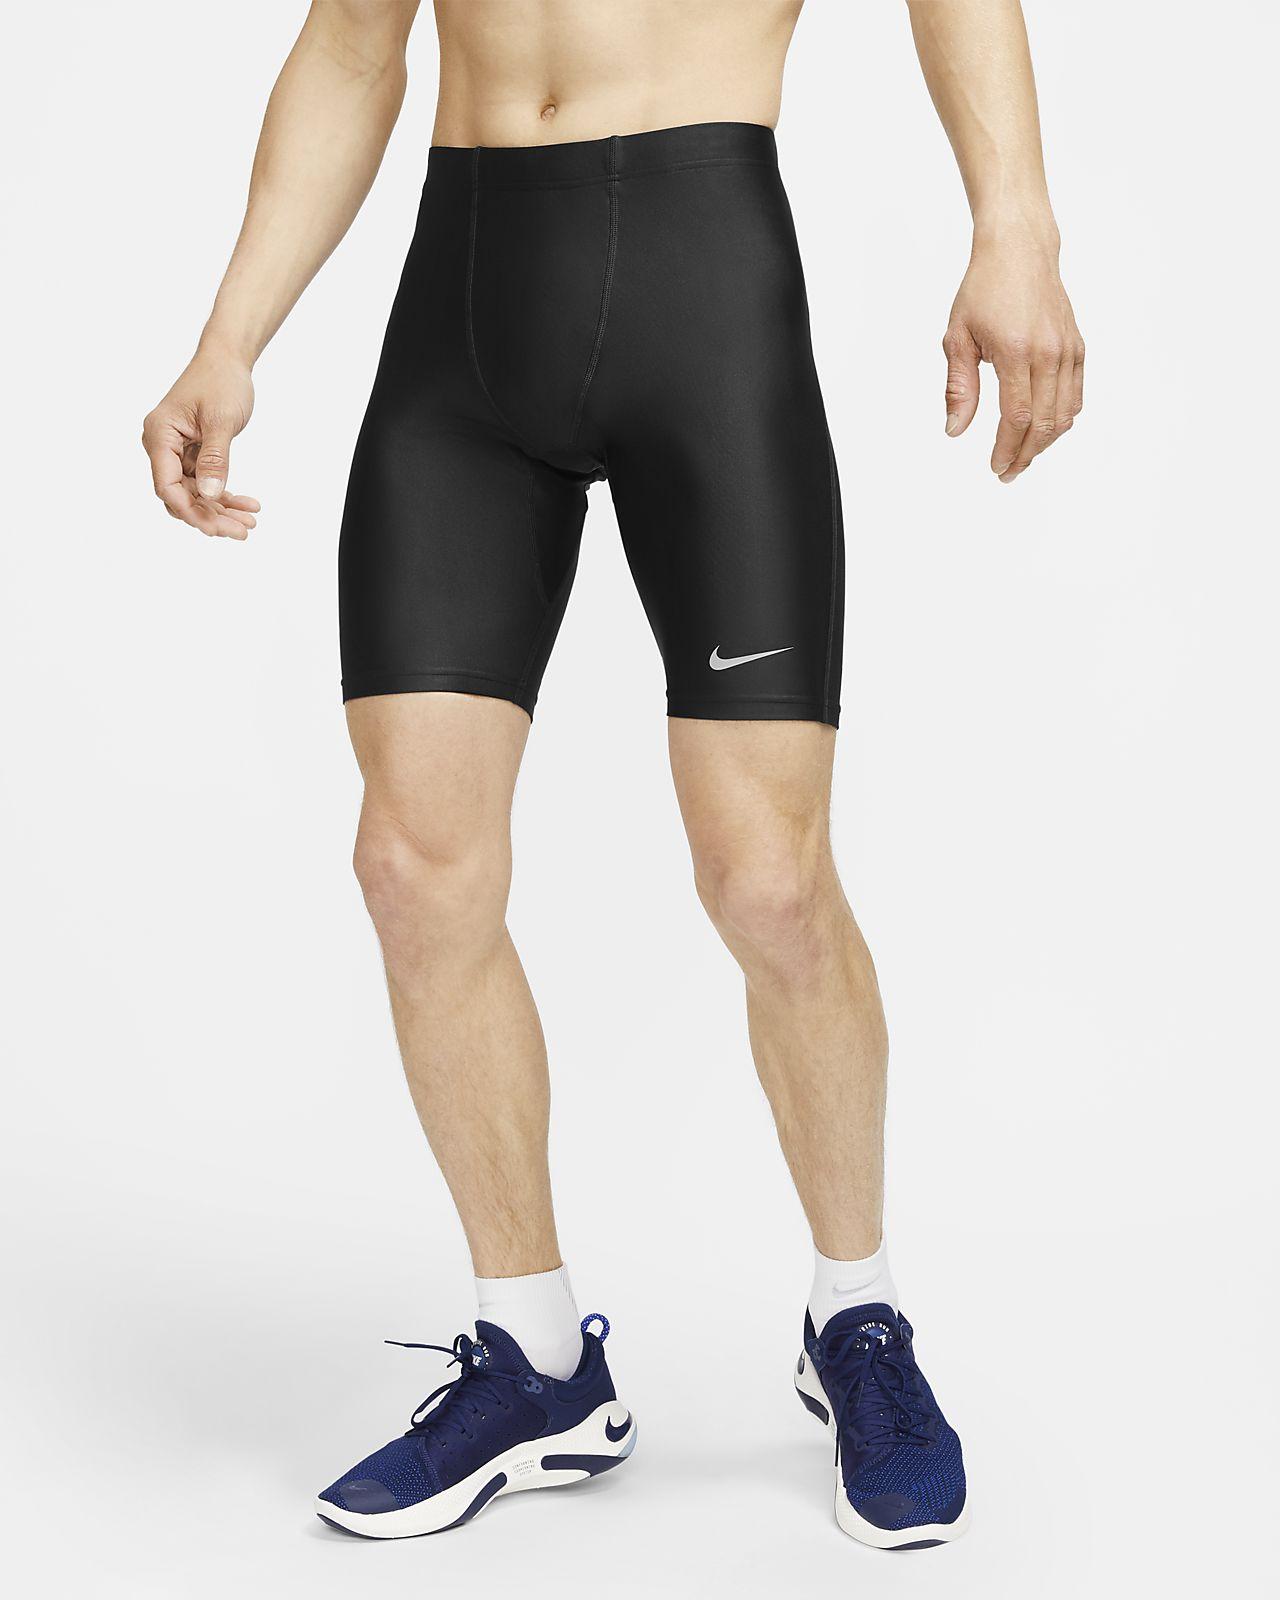 Legging de running demi-longueur Nike Fast pour Homme